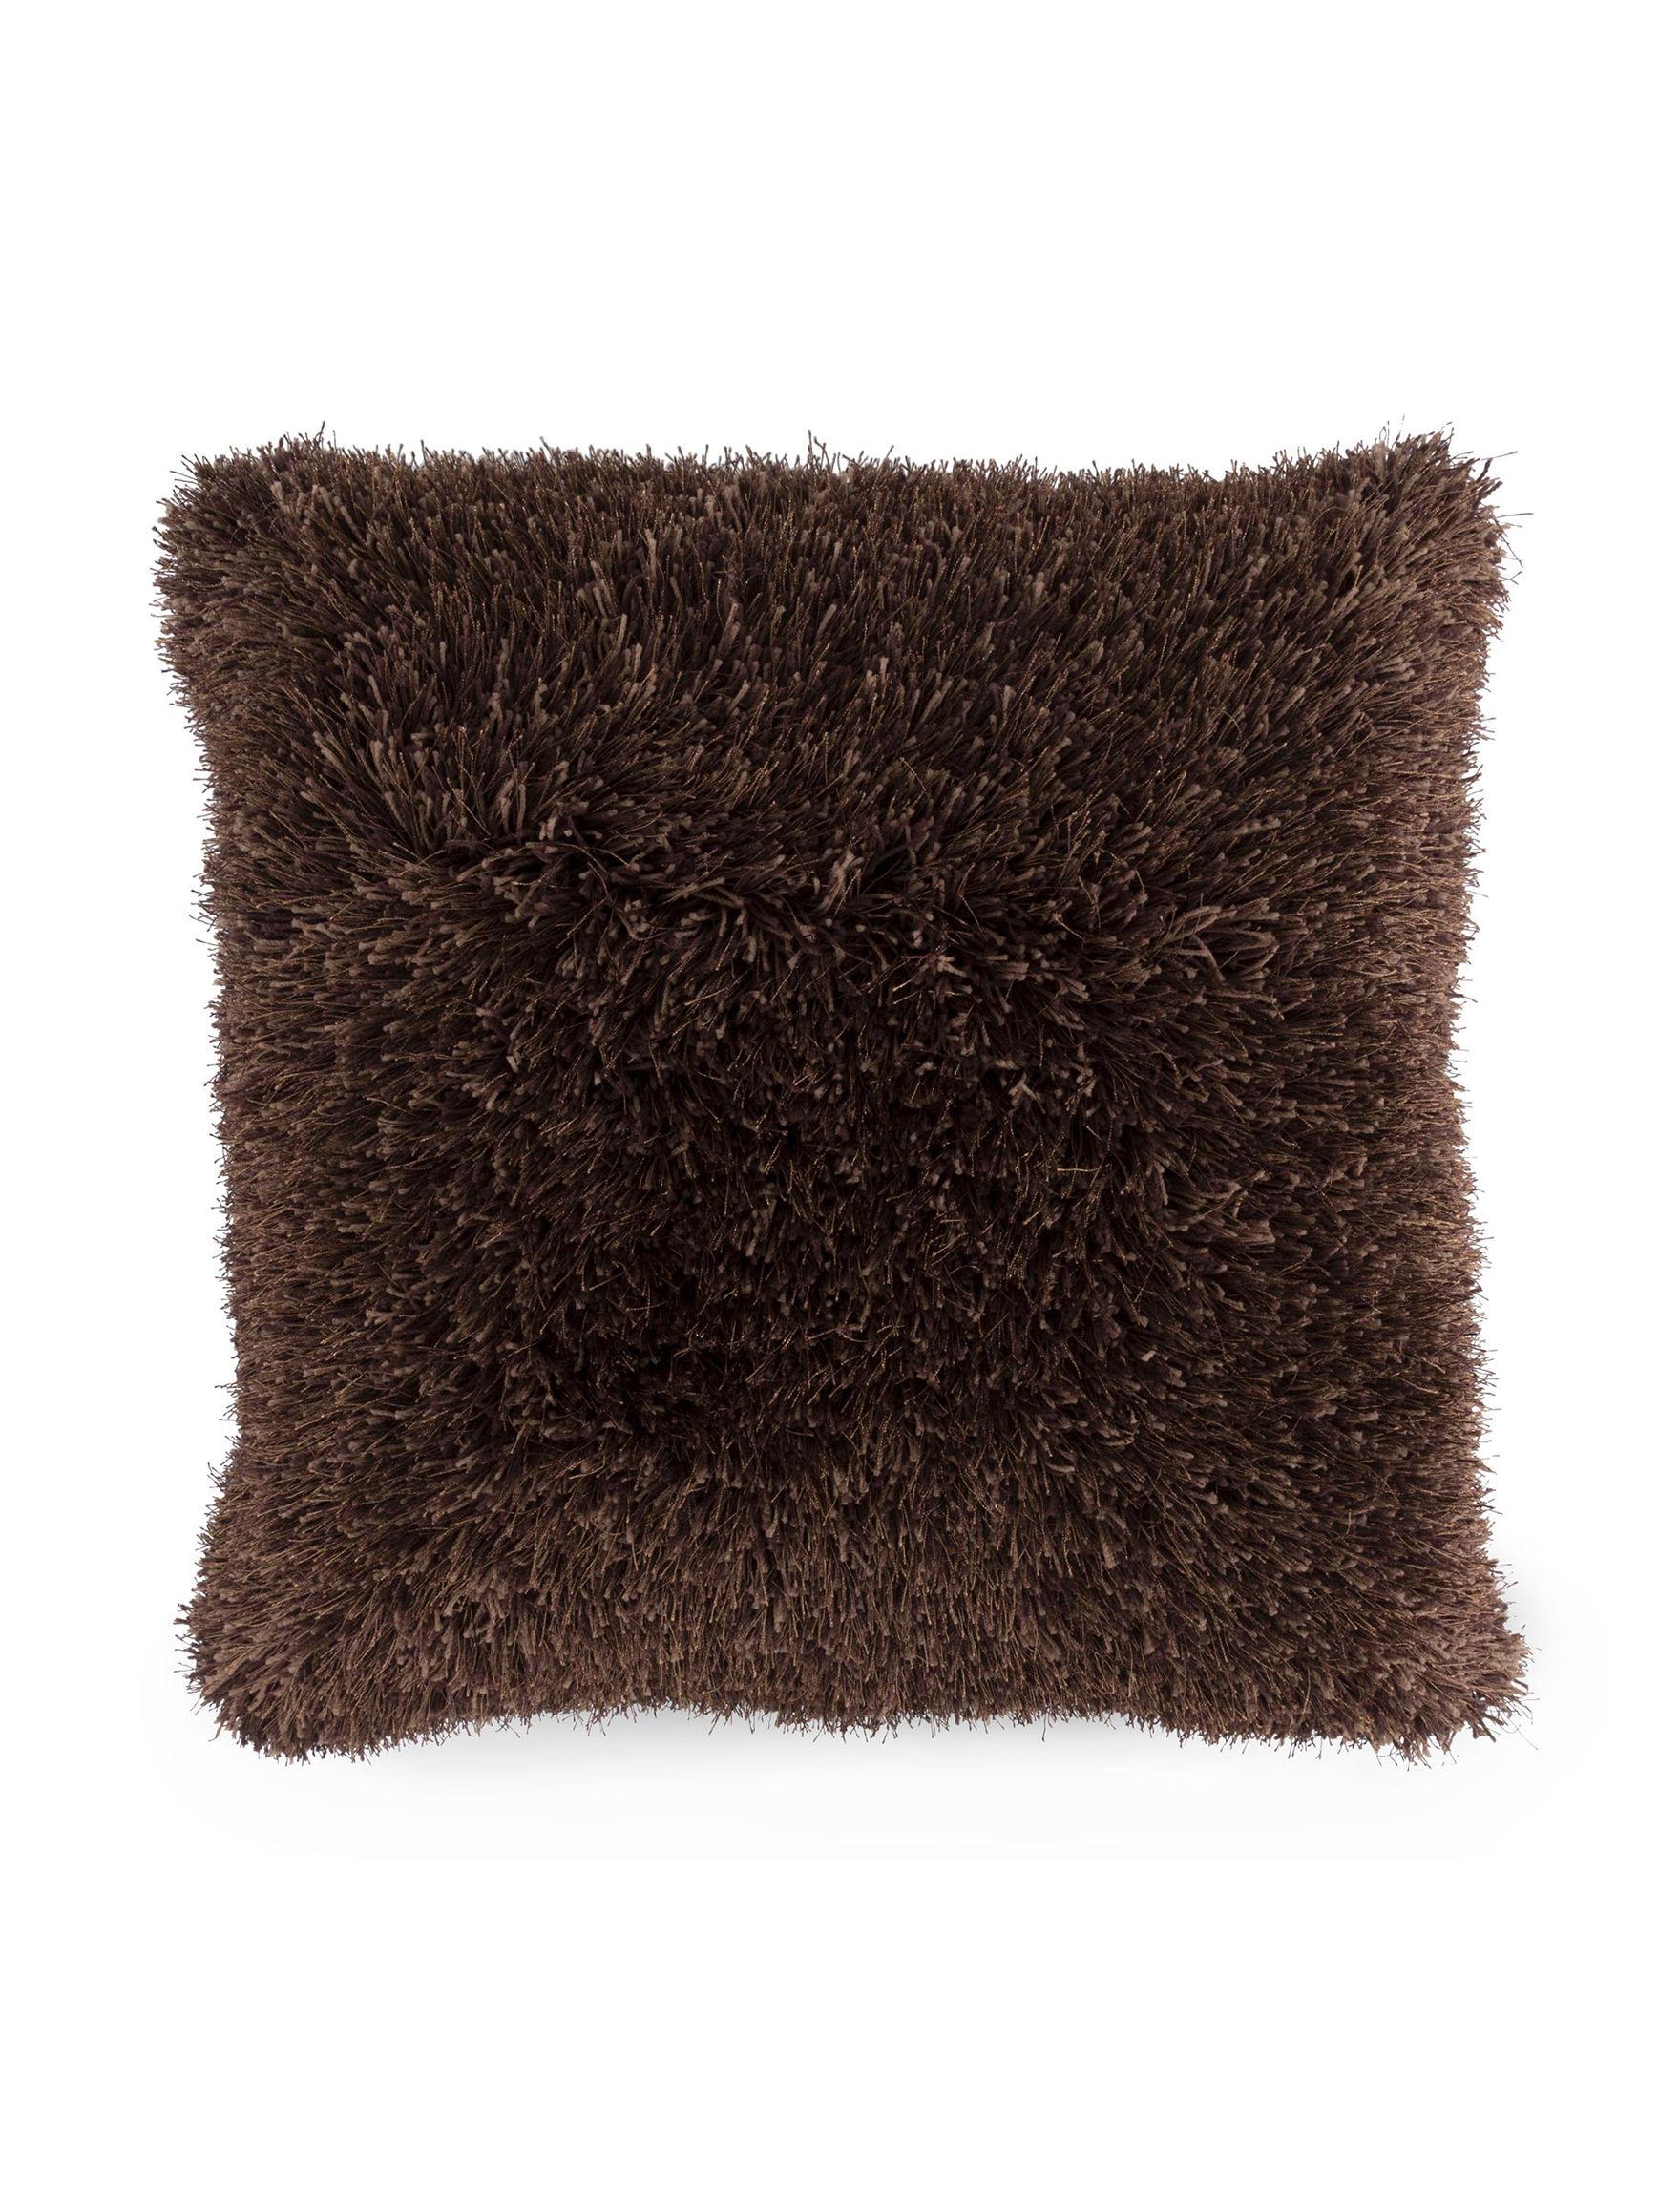 Lavish Home Brown Bed Pillows Decorative Pillows